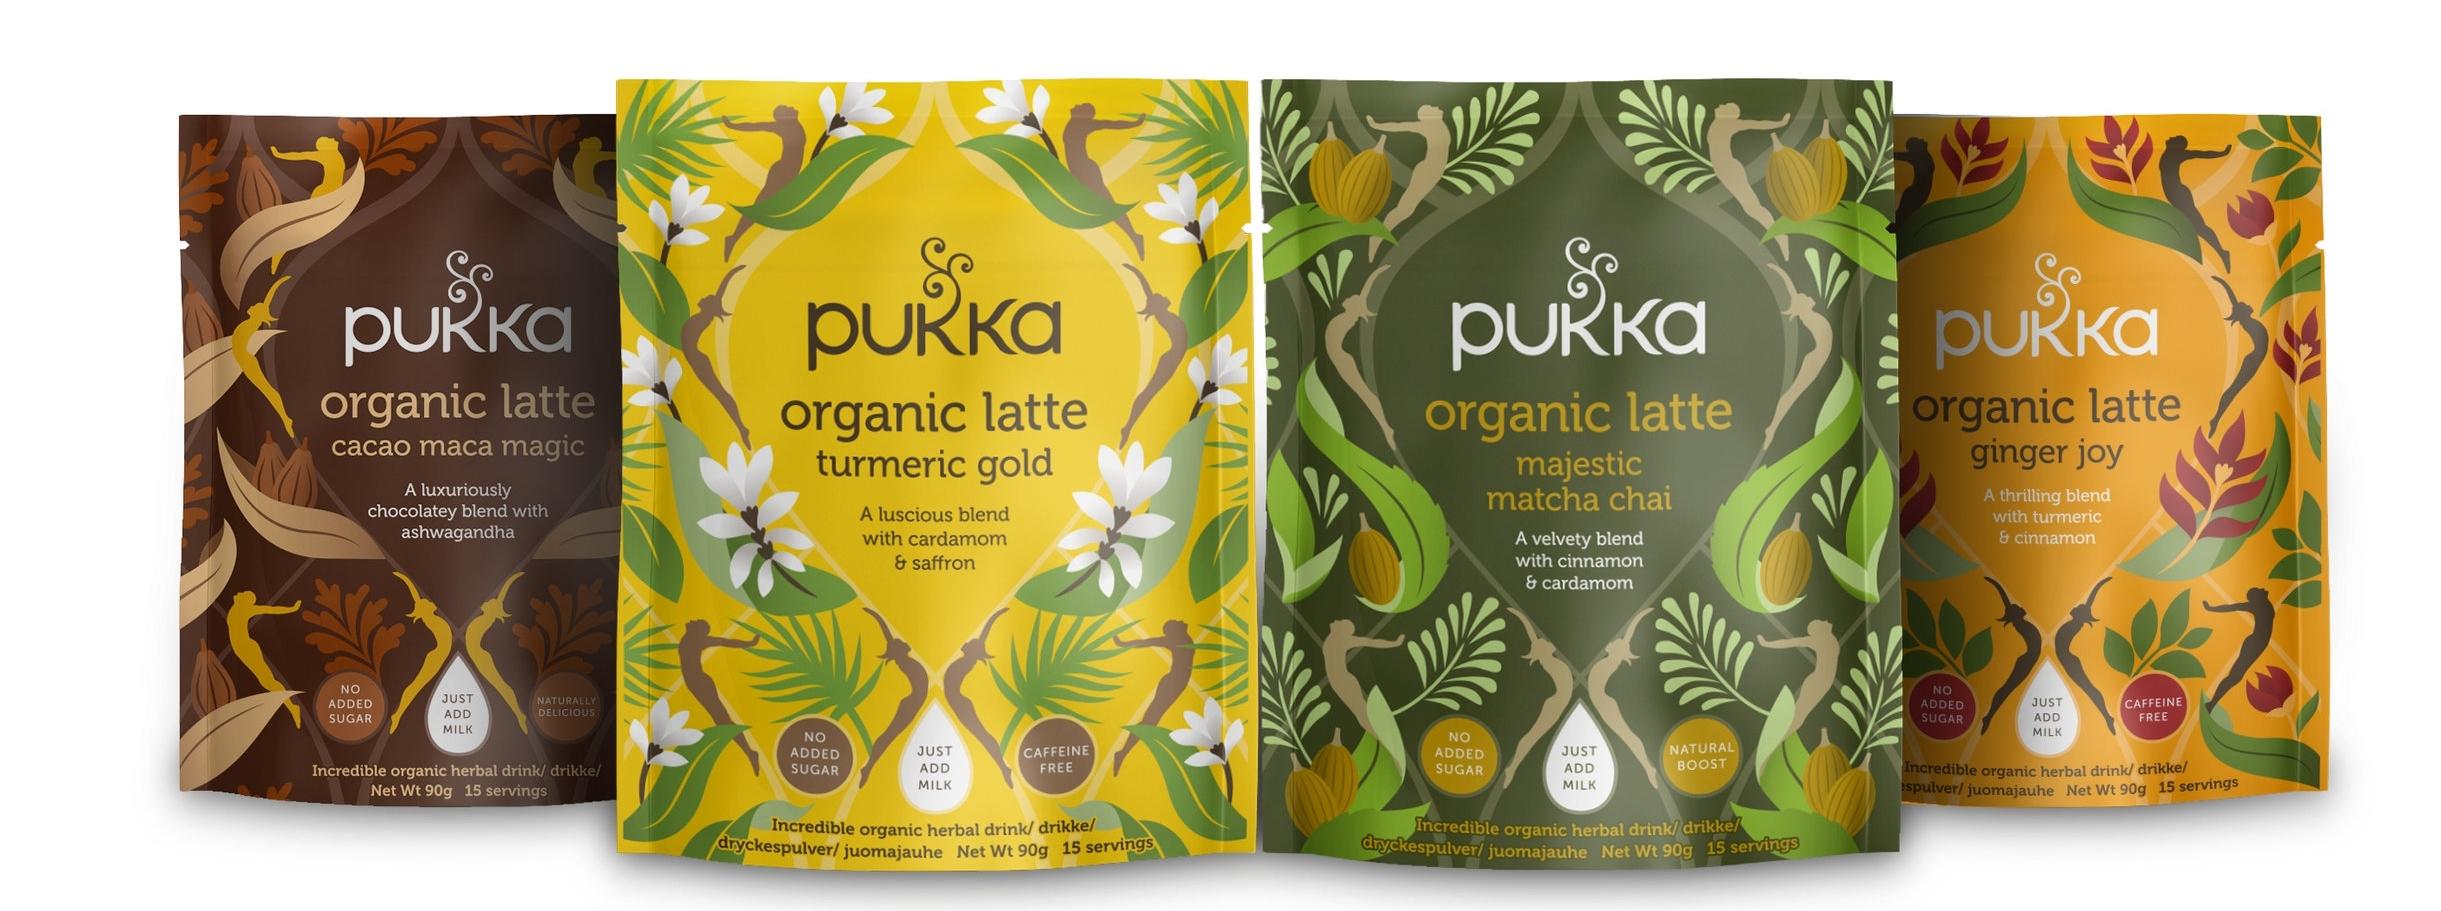 Pukka Latte Group CGI.jpg